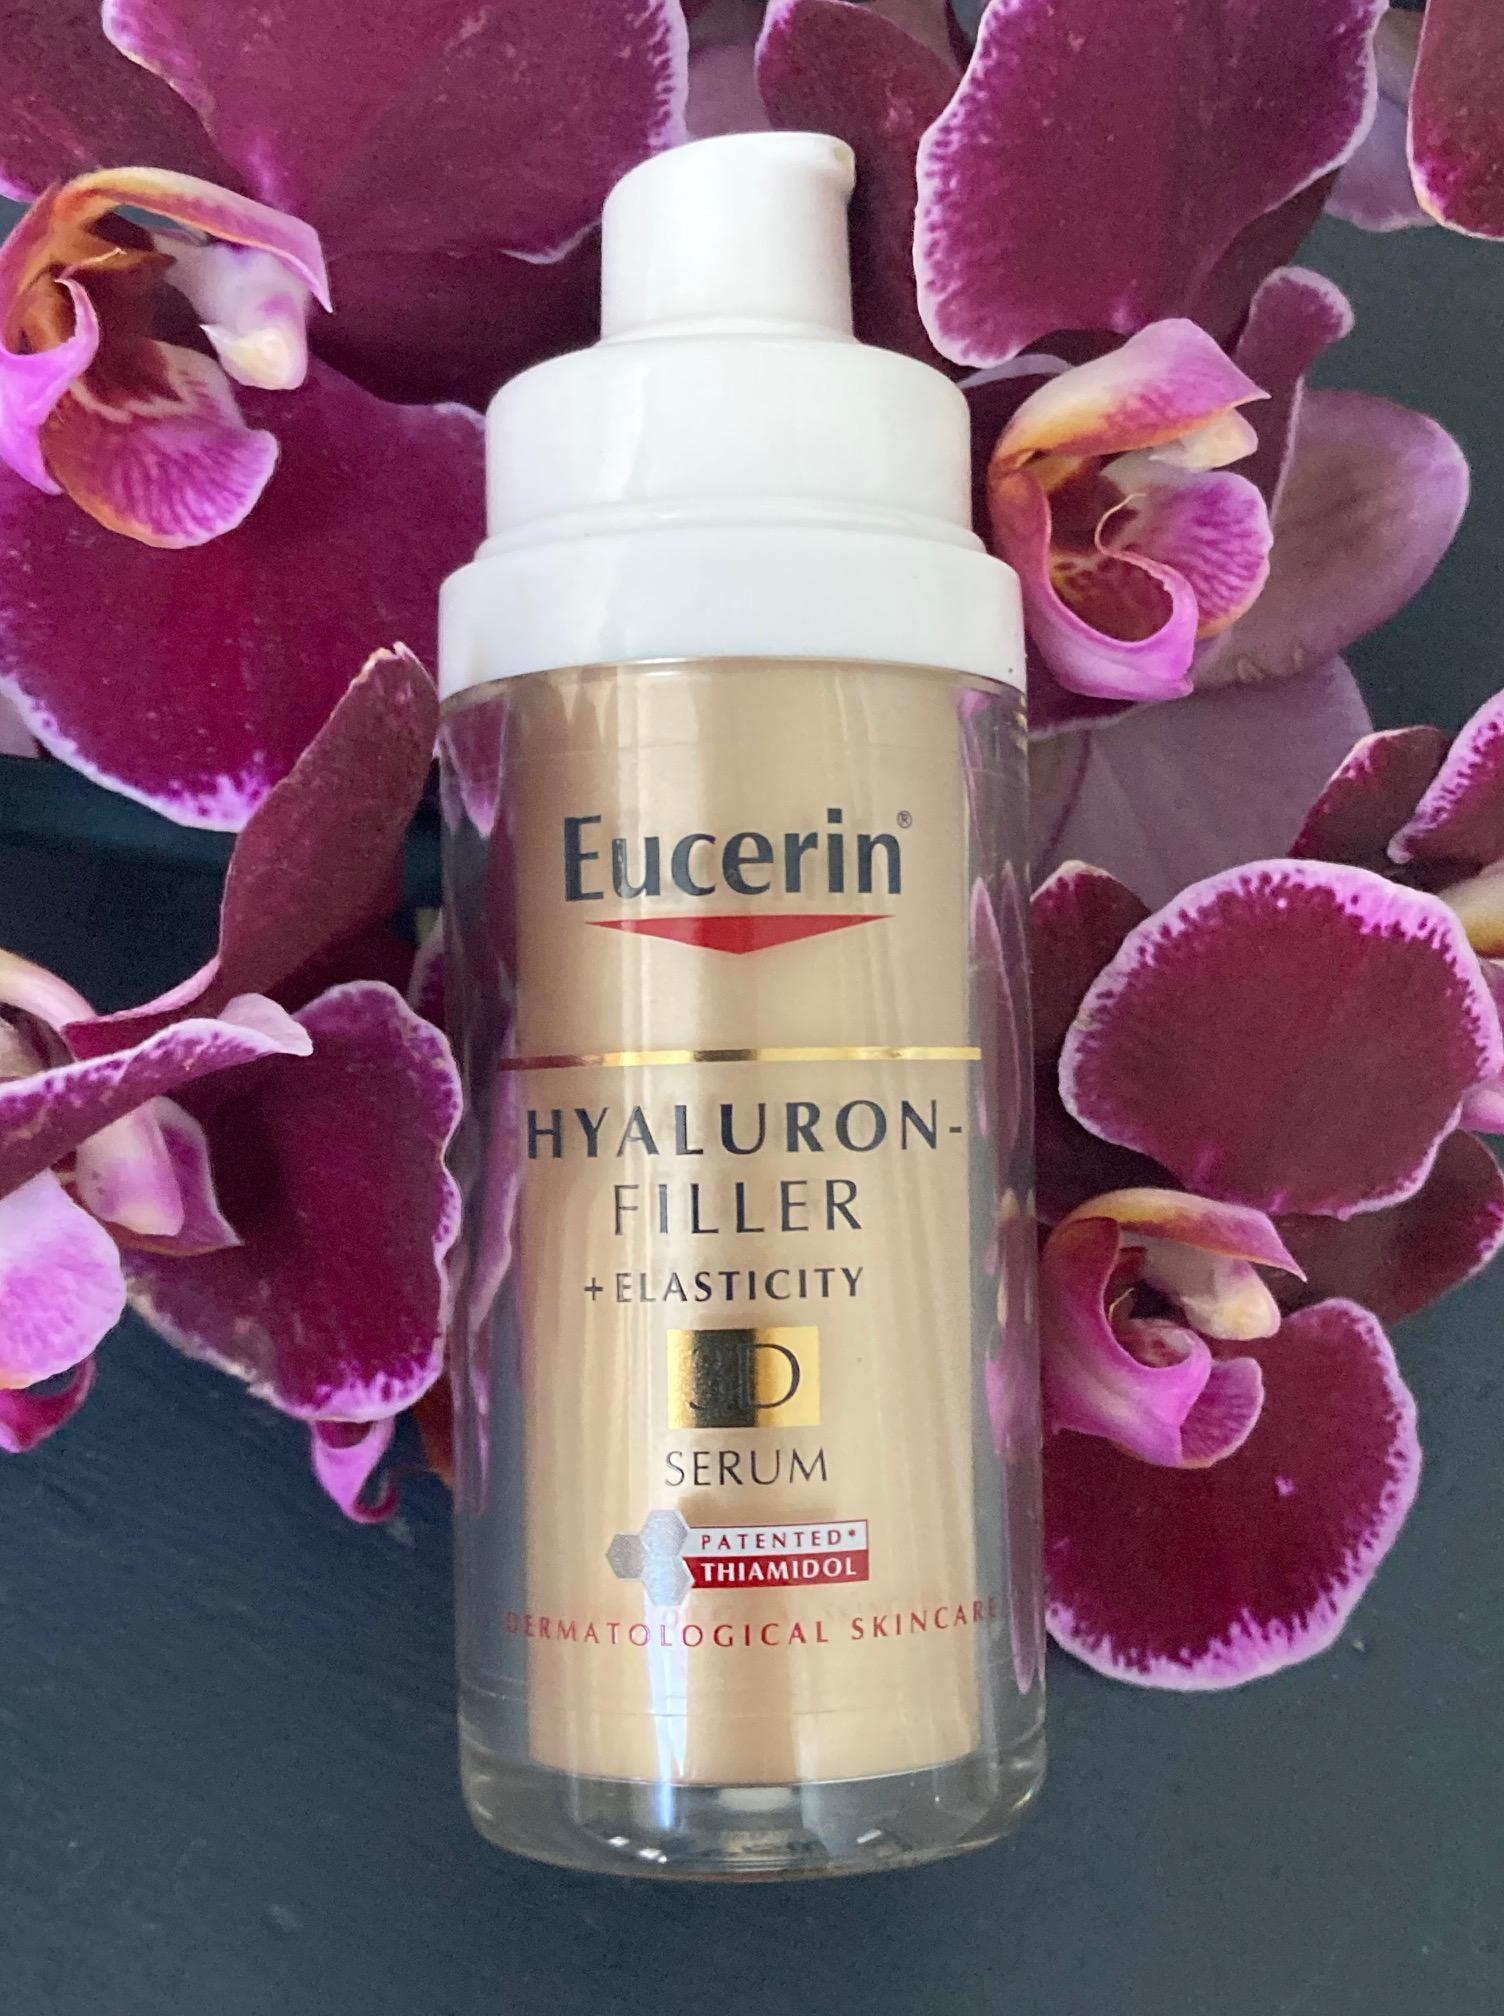 BEAUTY REVIEW: Eucerin Hyaluron Filler Serum